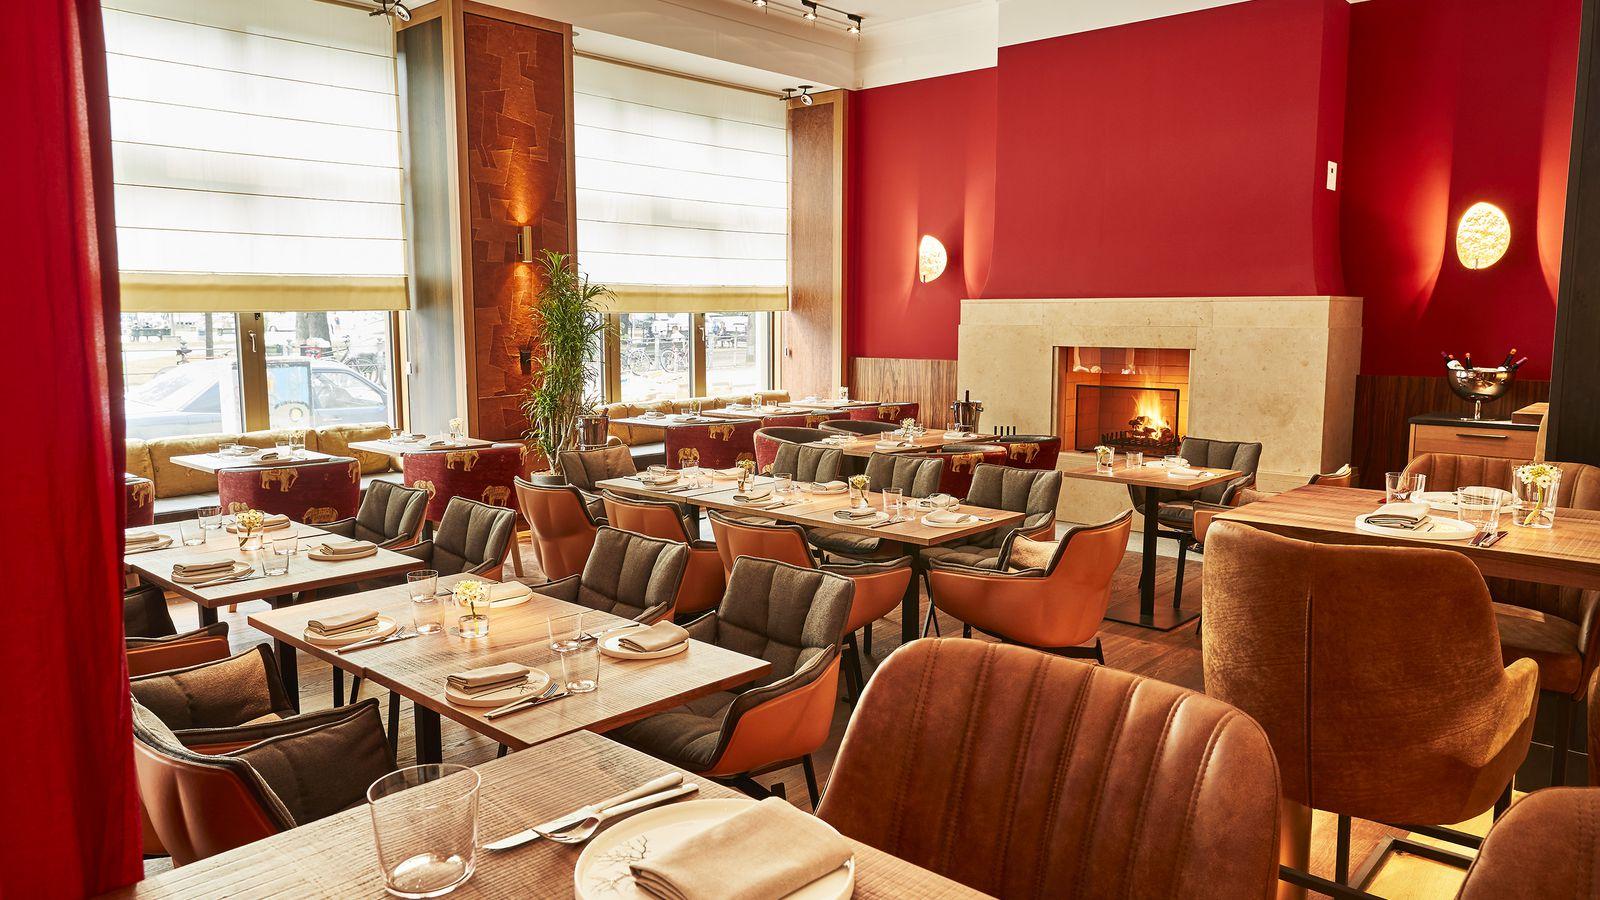 cosmopolitan restaurant in berlin kreuzberg the orania. Black Bedroom Furniture Sets. Home Design Ideas